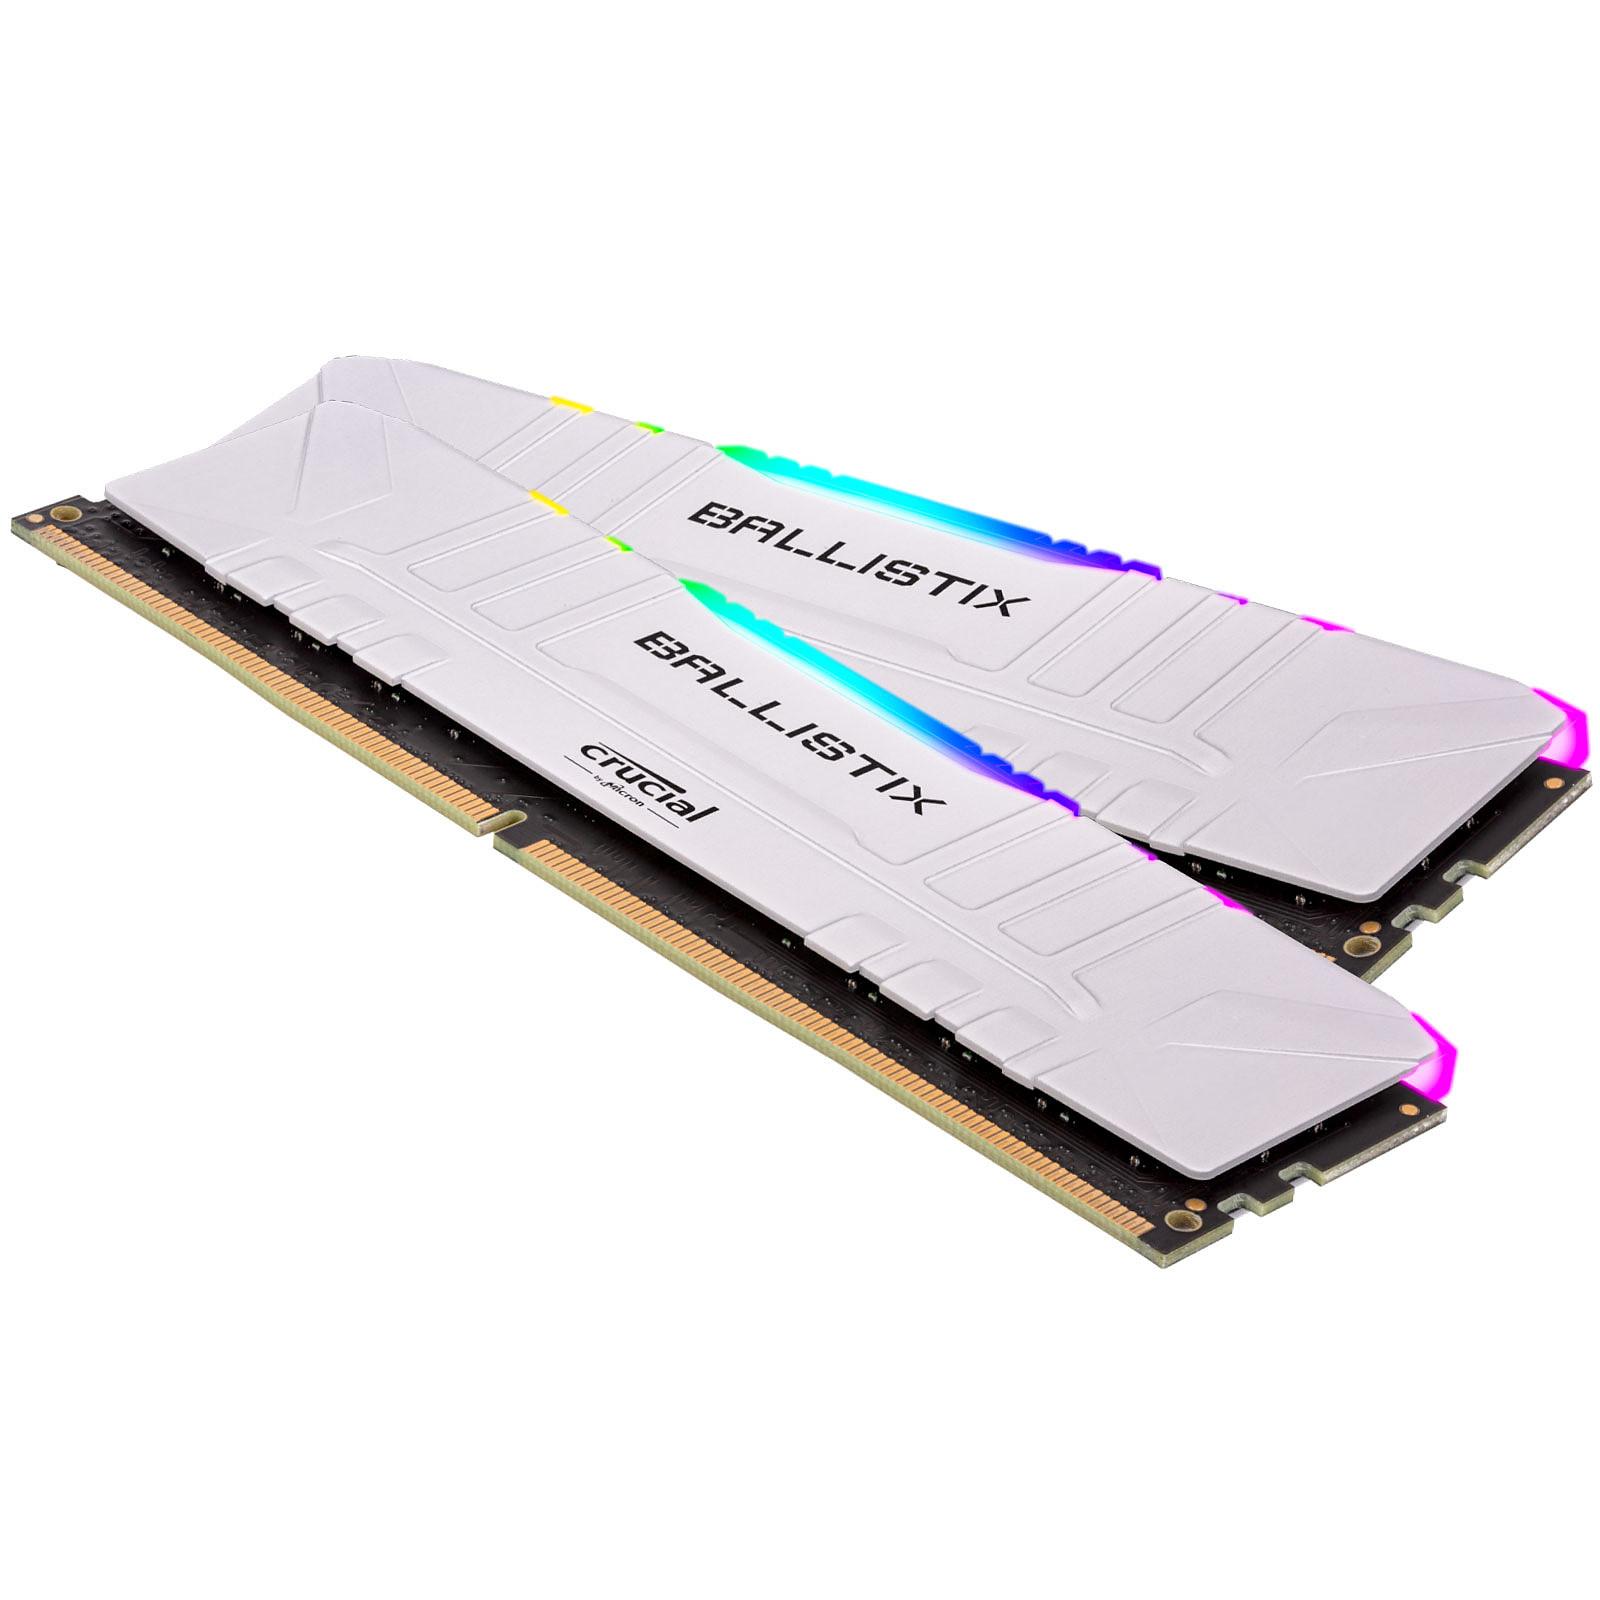 Ballistix White RGB DDR4 64 Go (2 x 32 Go) 3200 MHz CL16